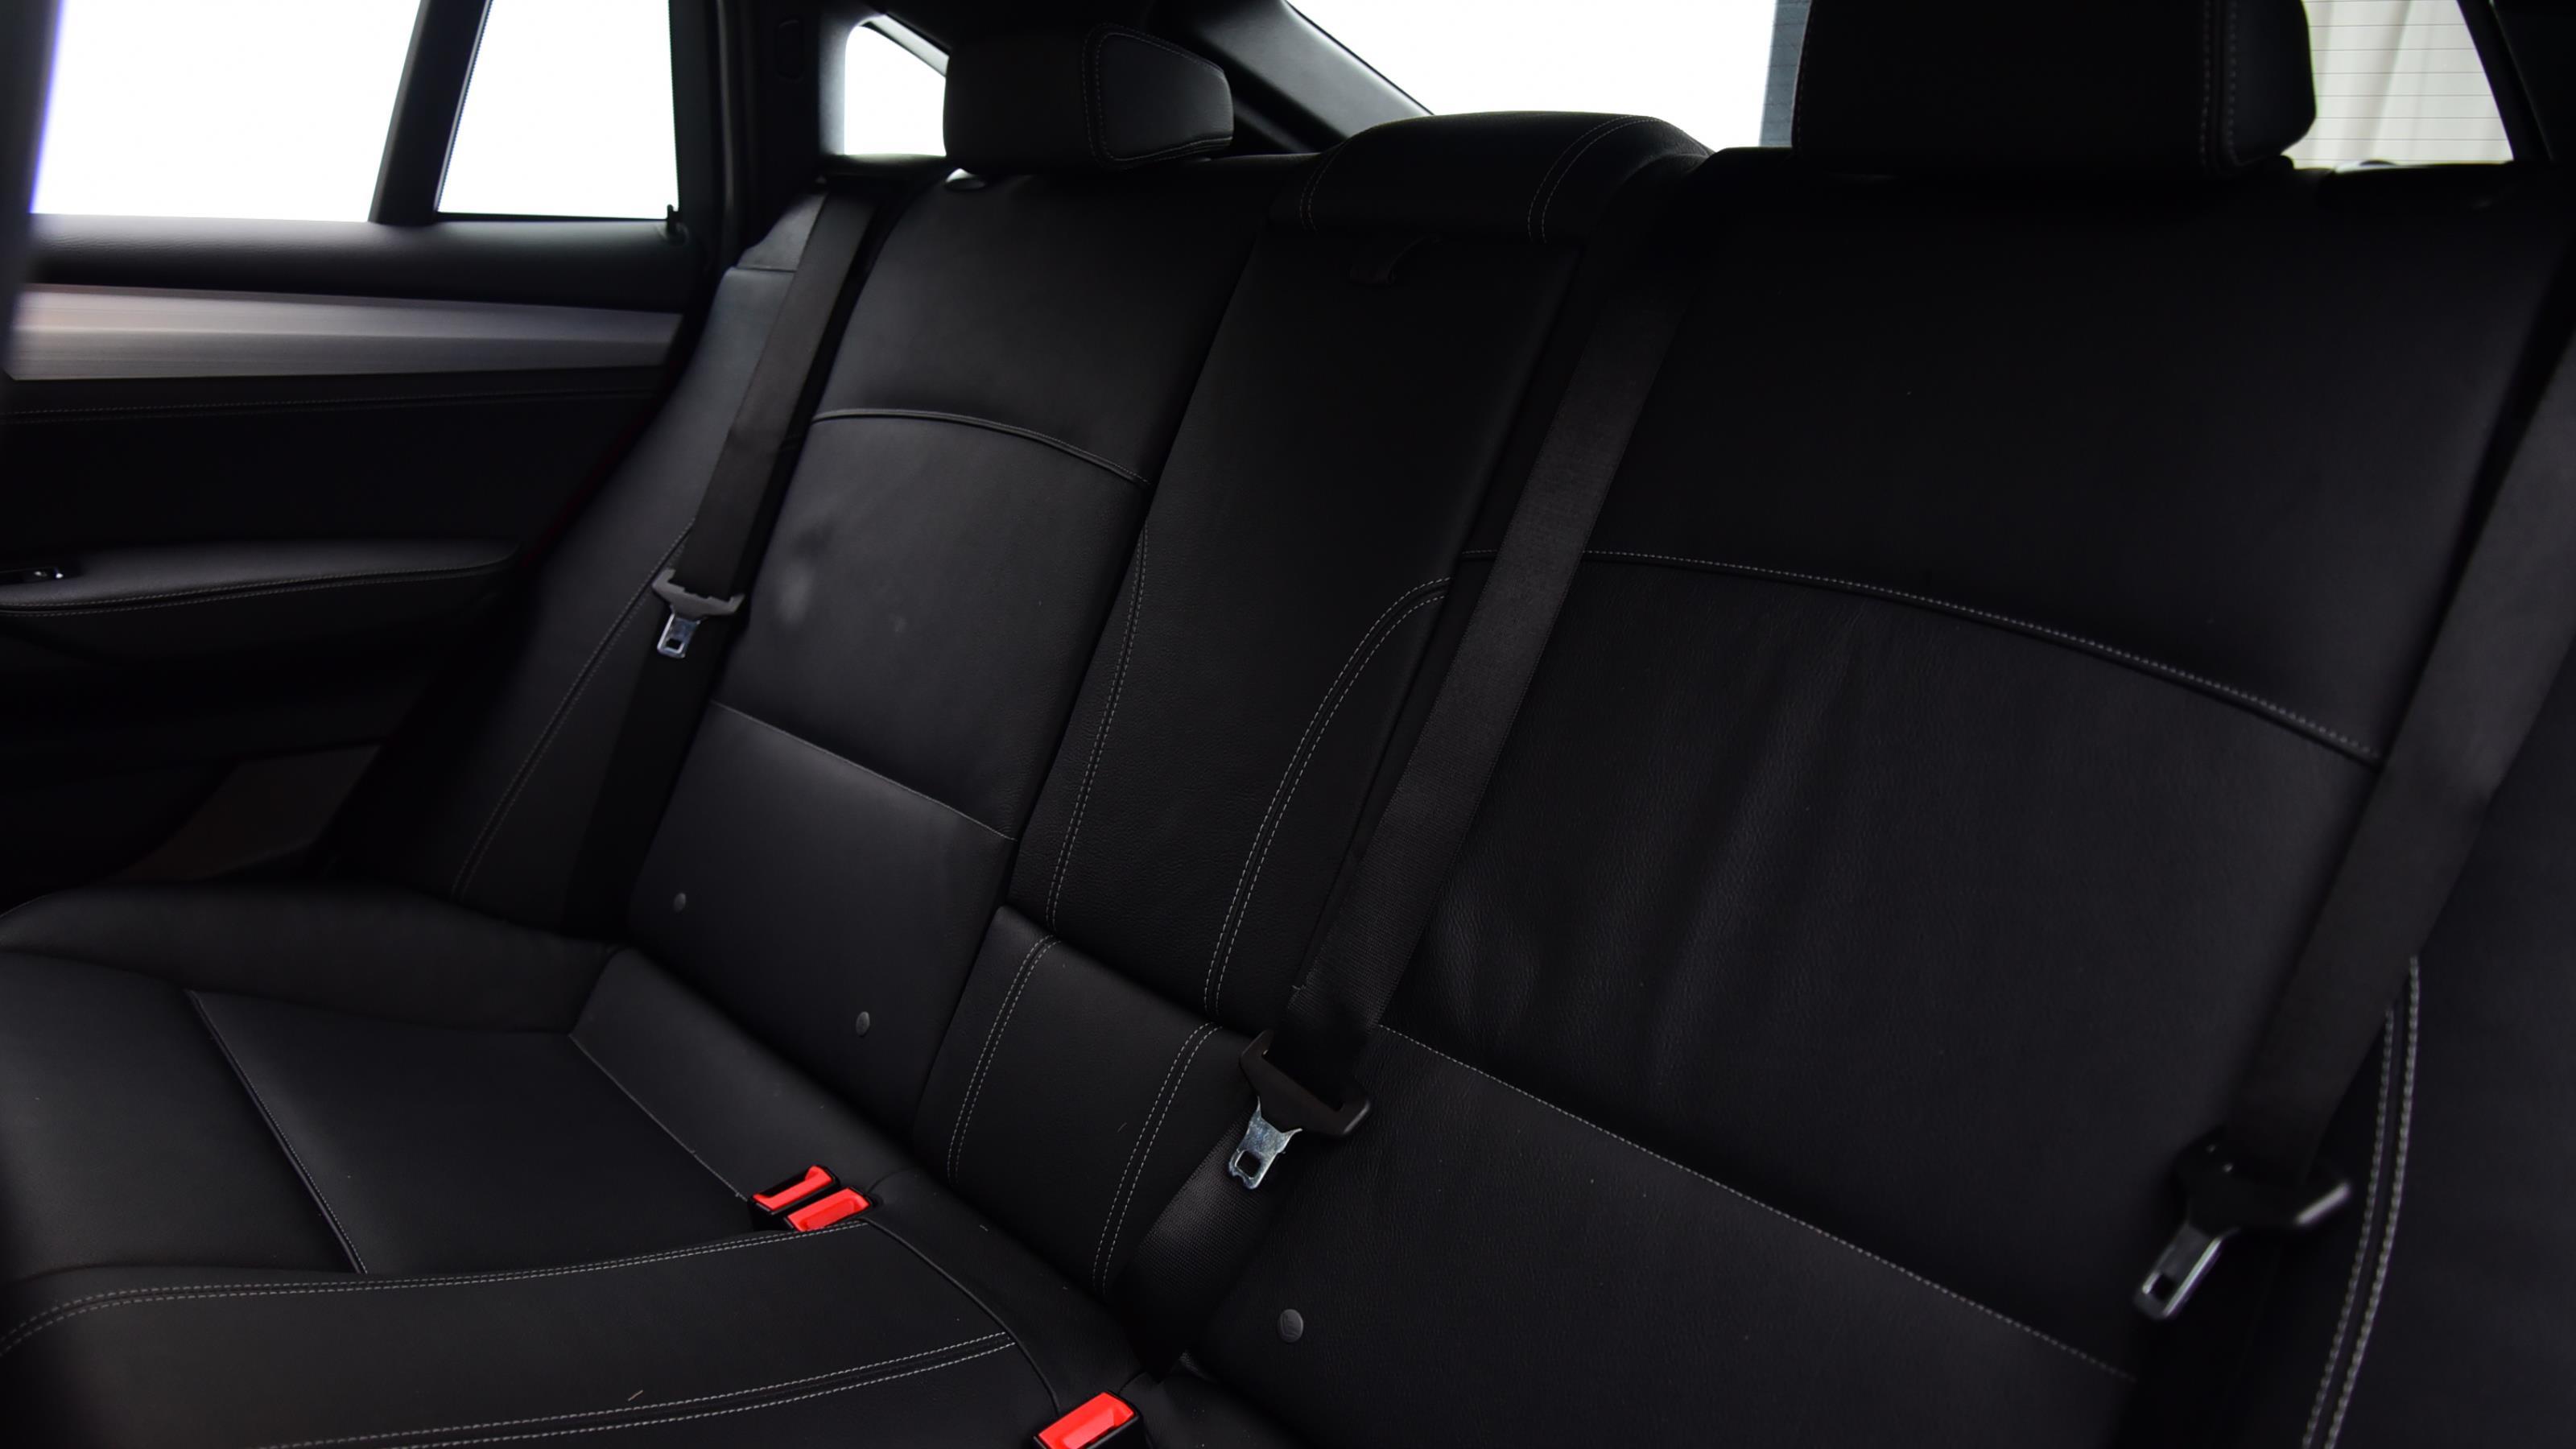 Used 15 BMW X4 xDrive20d M Sport 5dr Step Auto Red at Saxton4x4